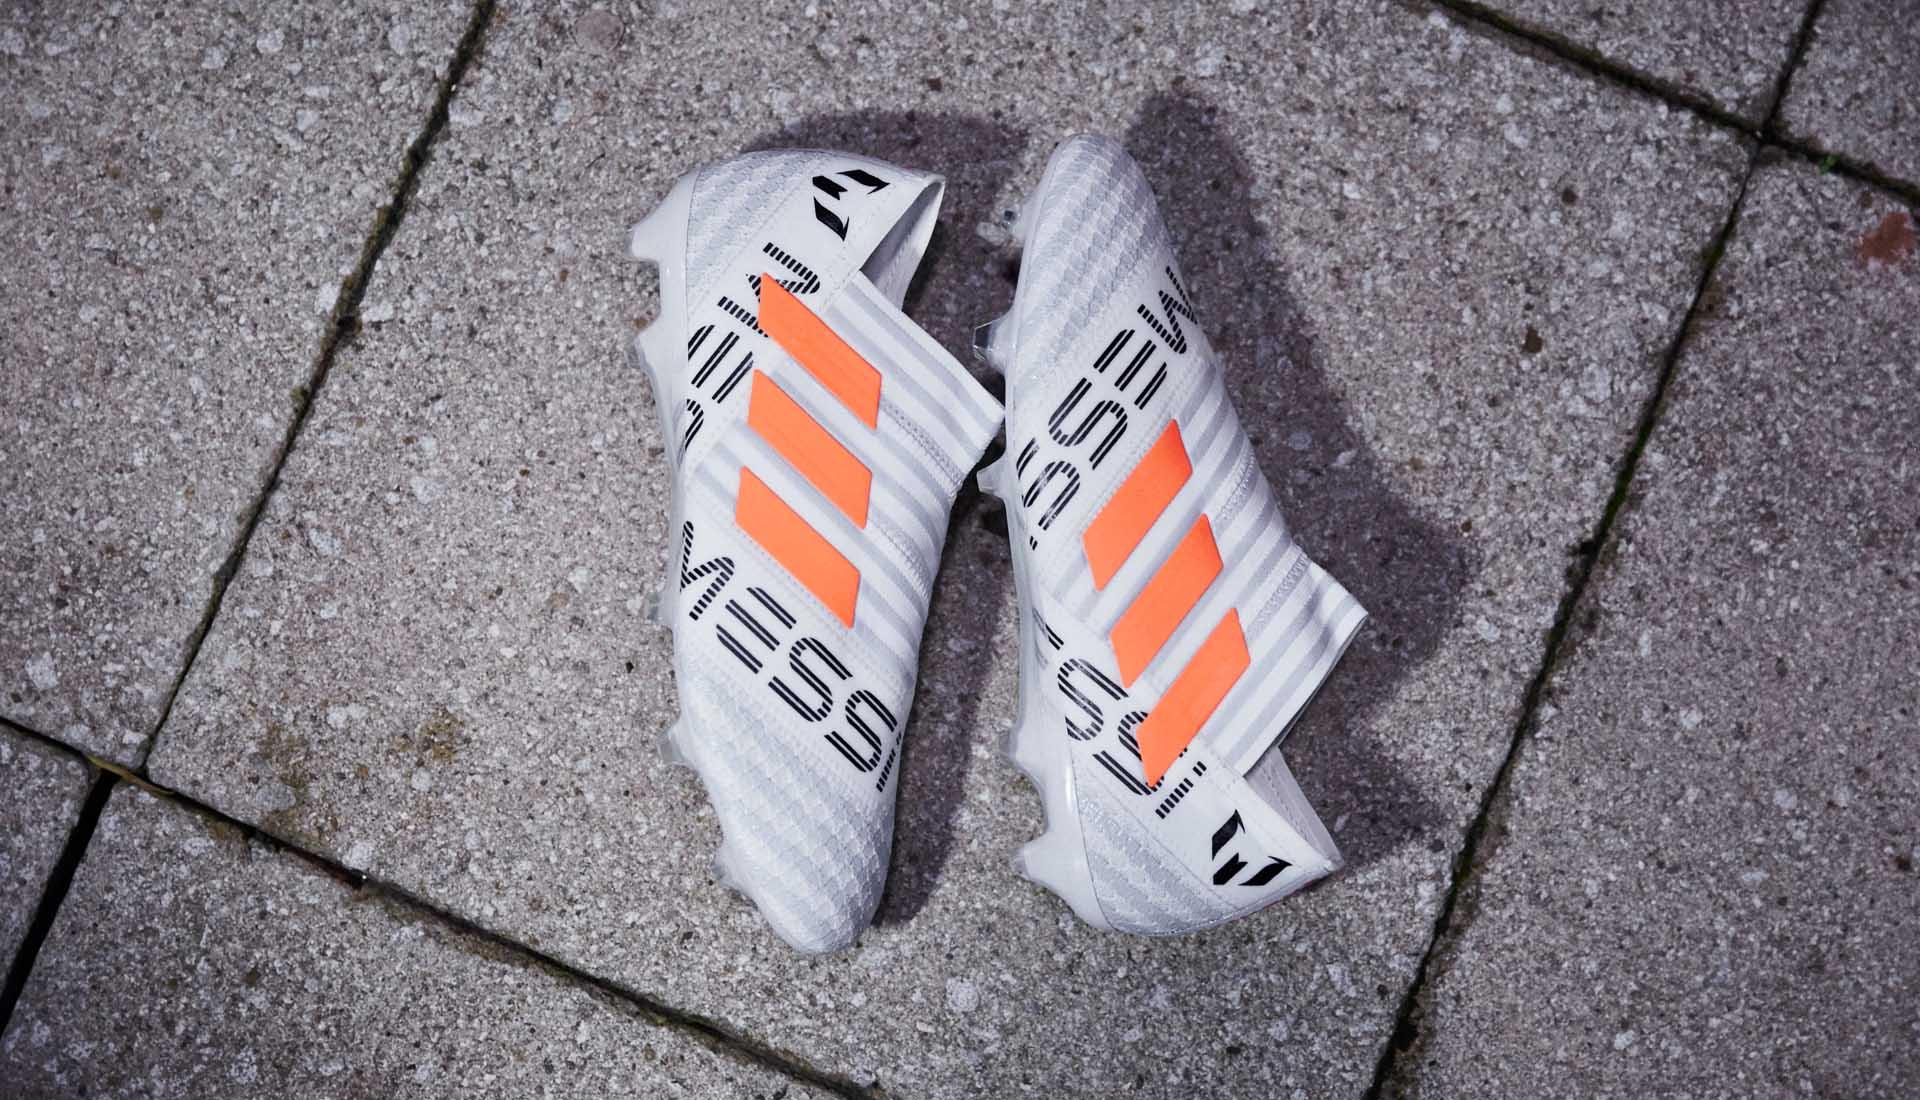 chaussure-adidas-football-nemeziz-messi-pyro-storm-octobre-2017-2